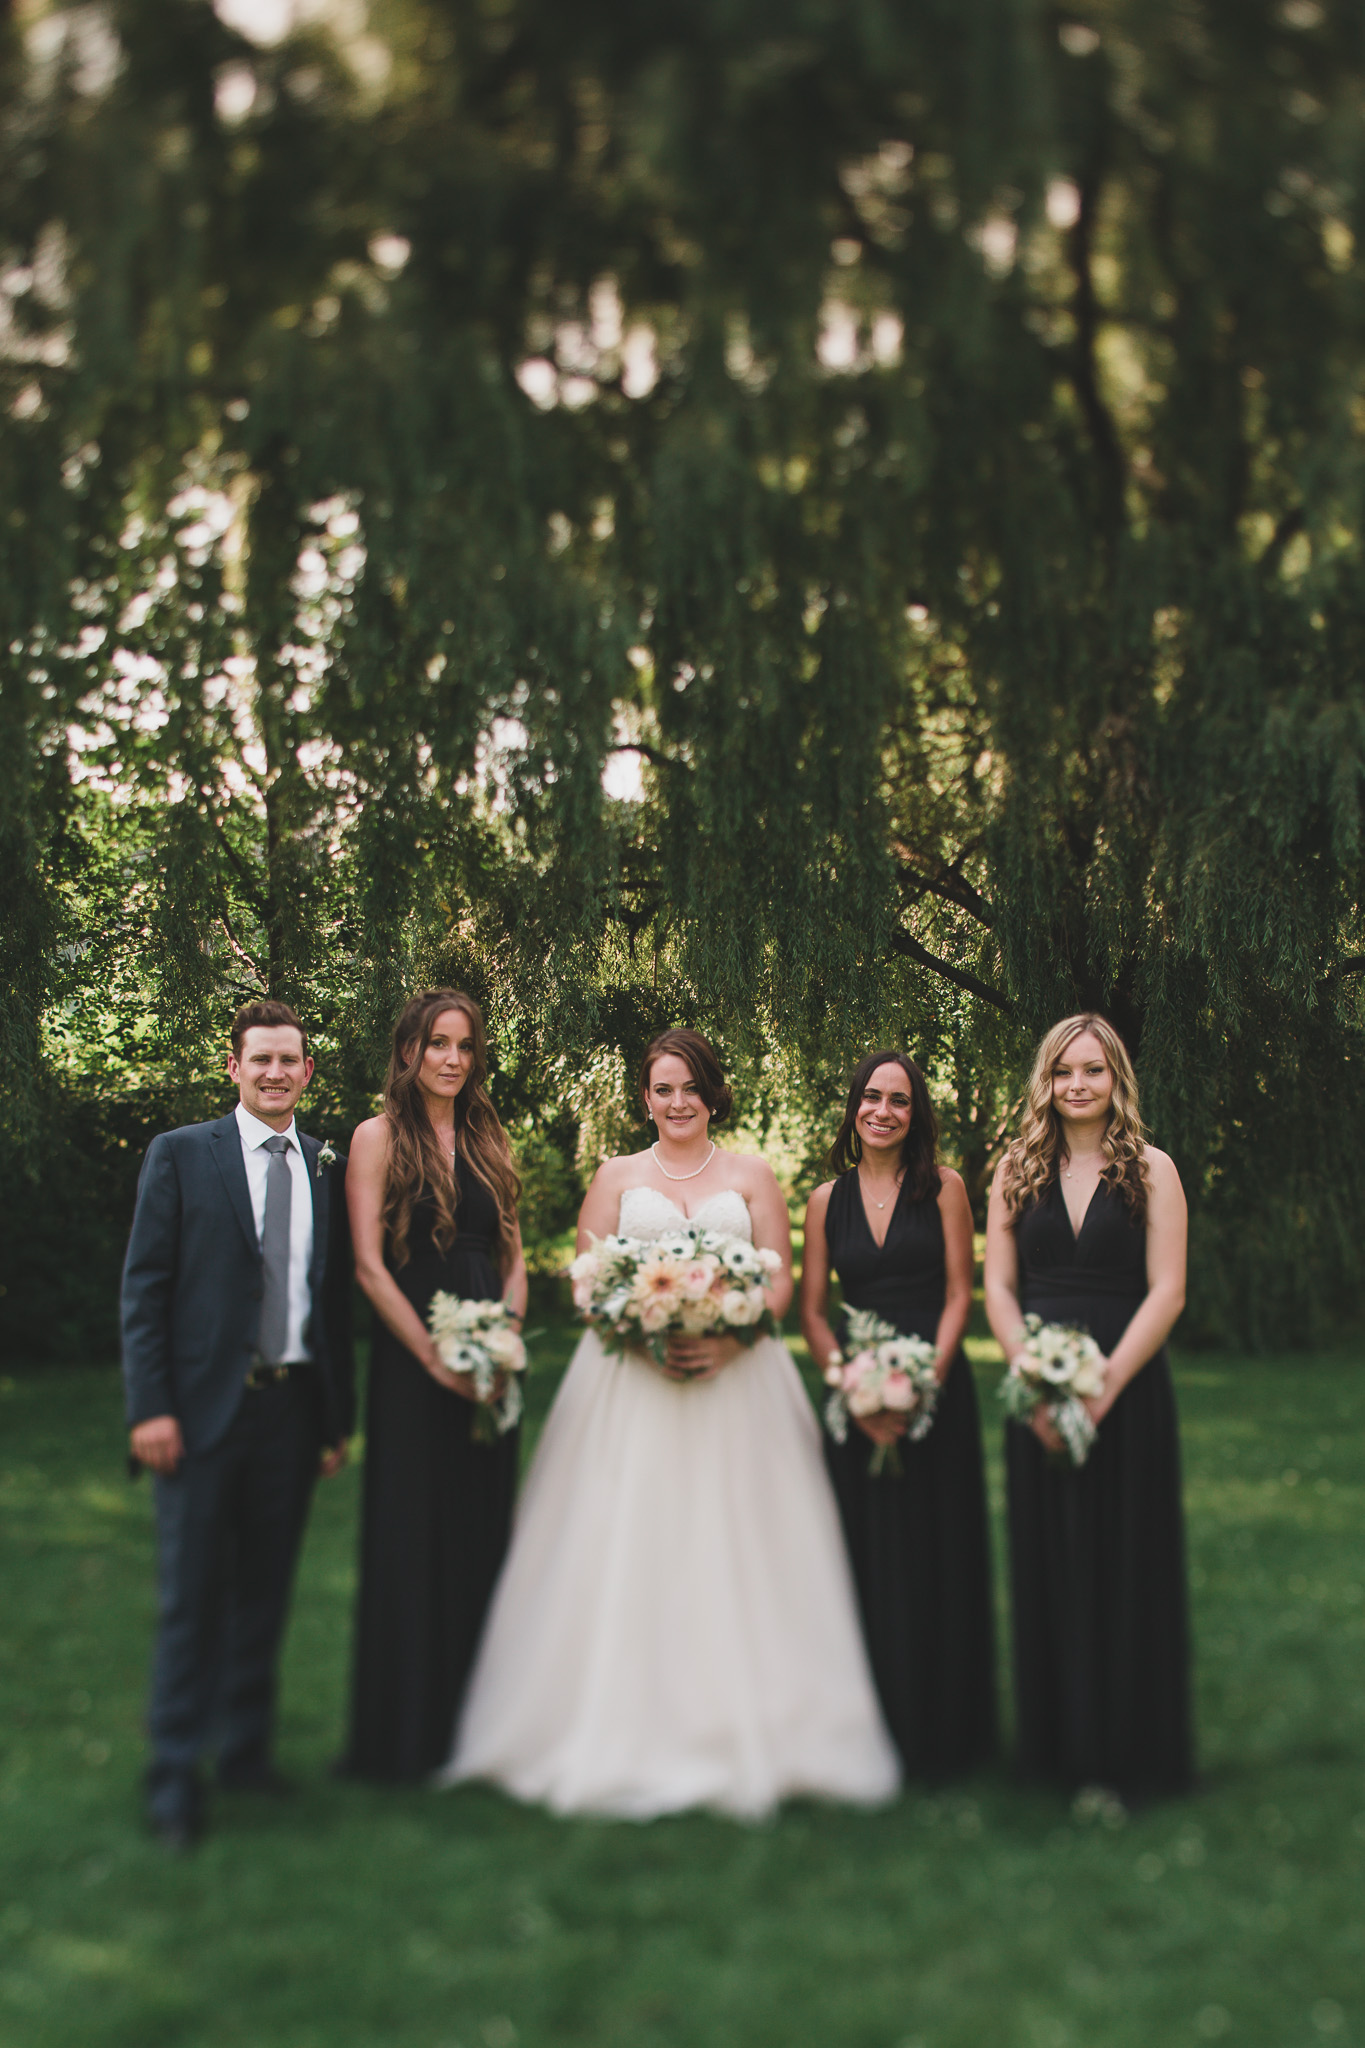 Tilt Shift Bridal Party Photos